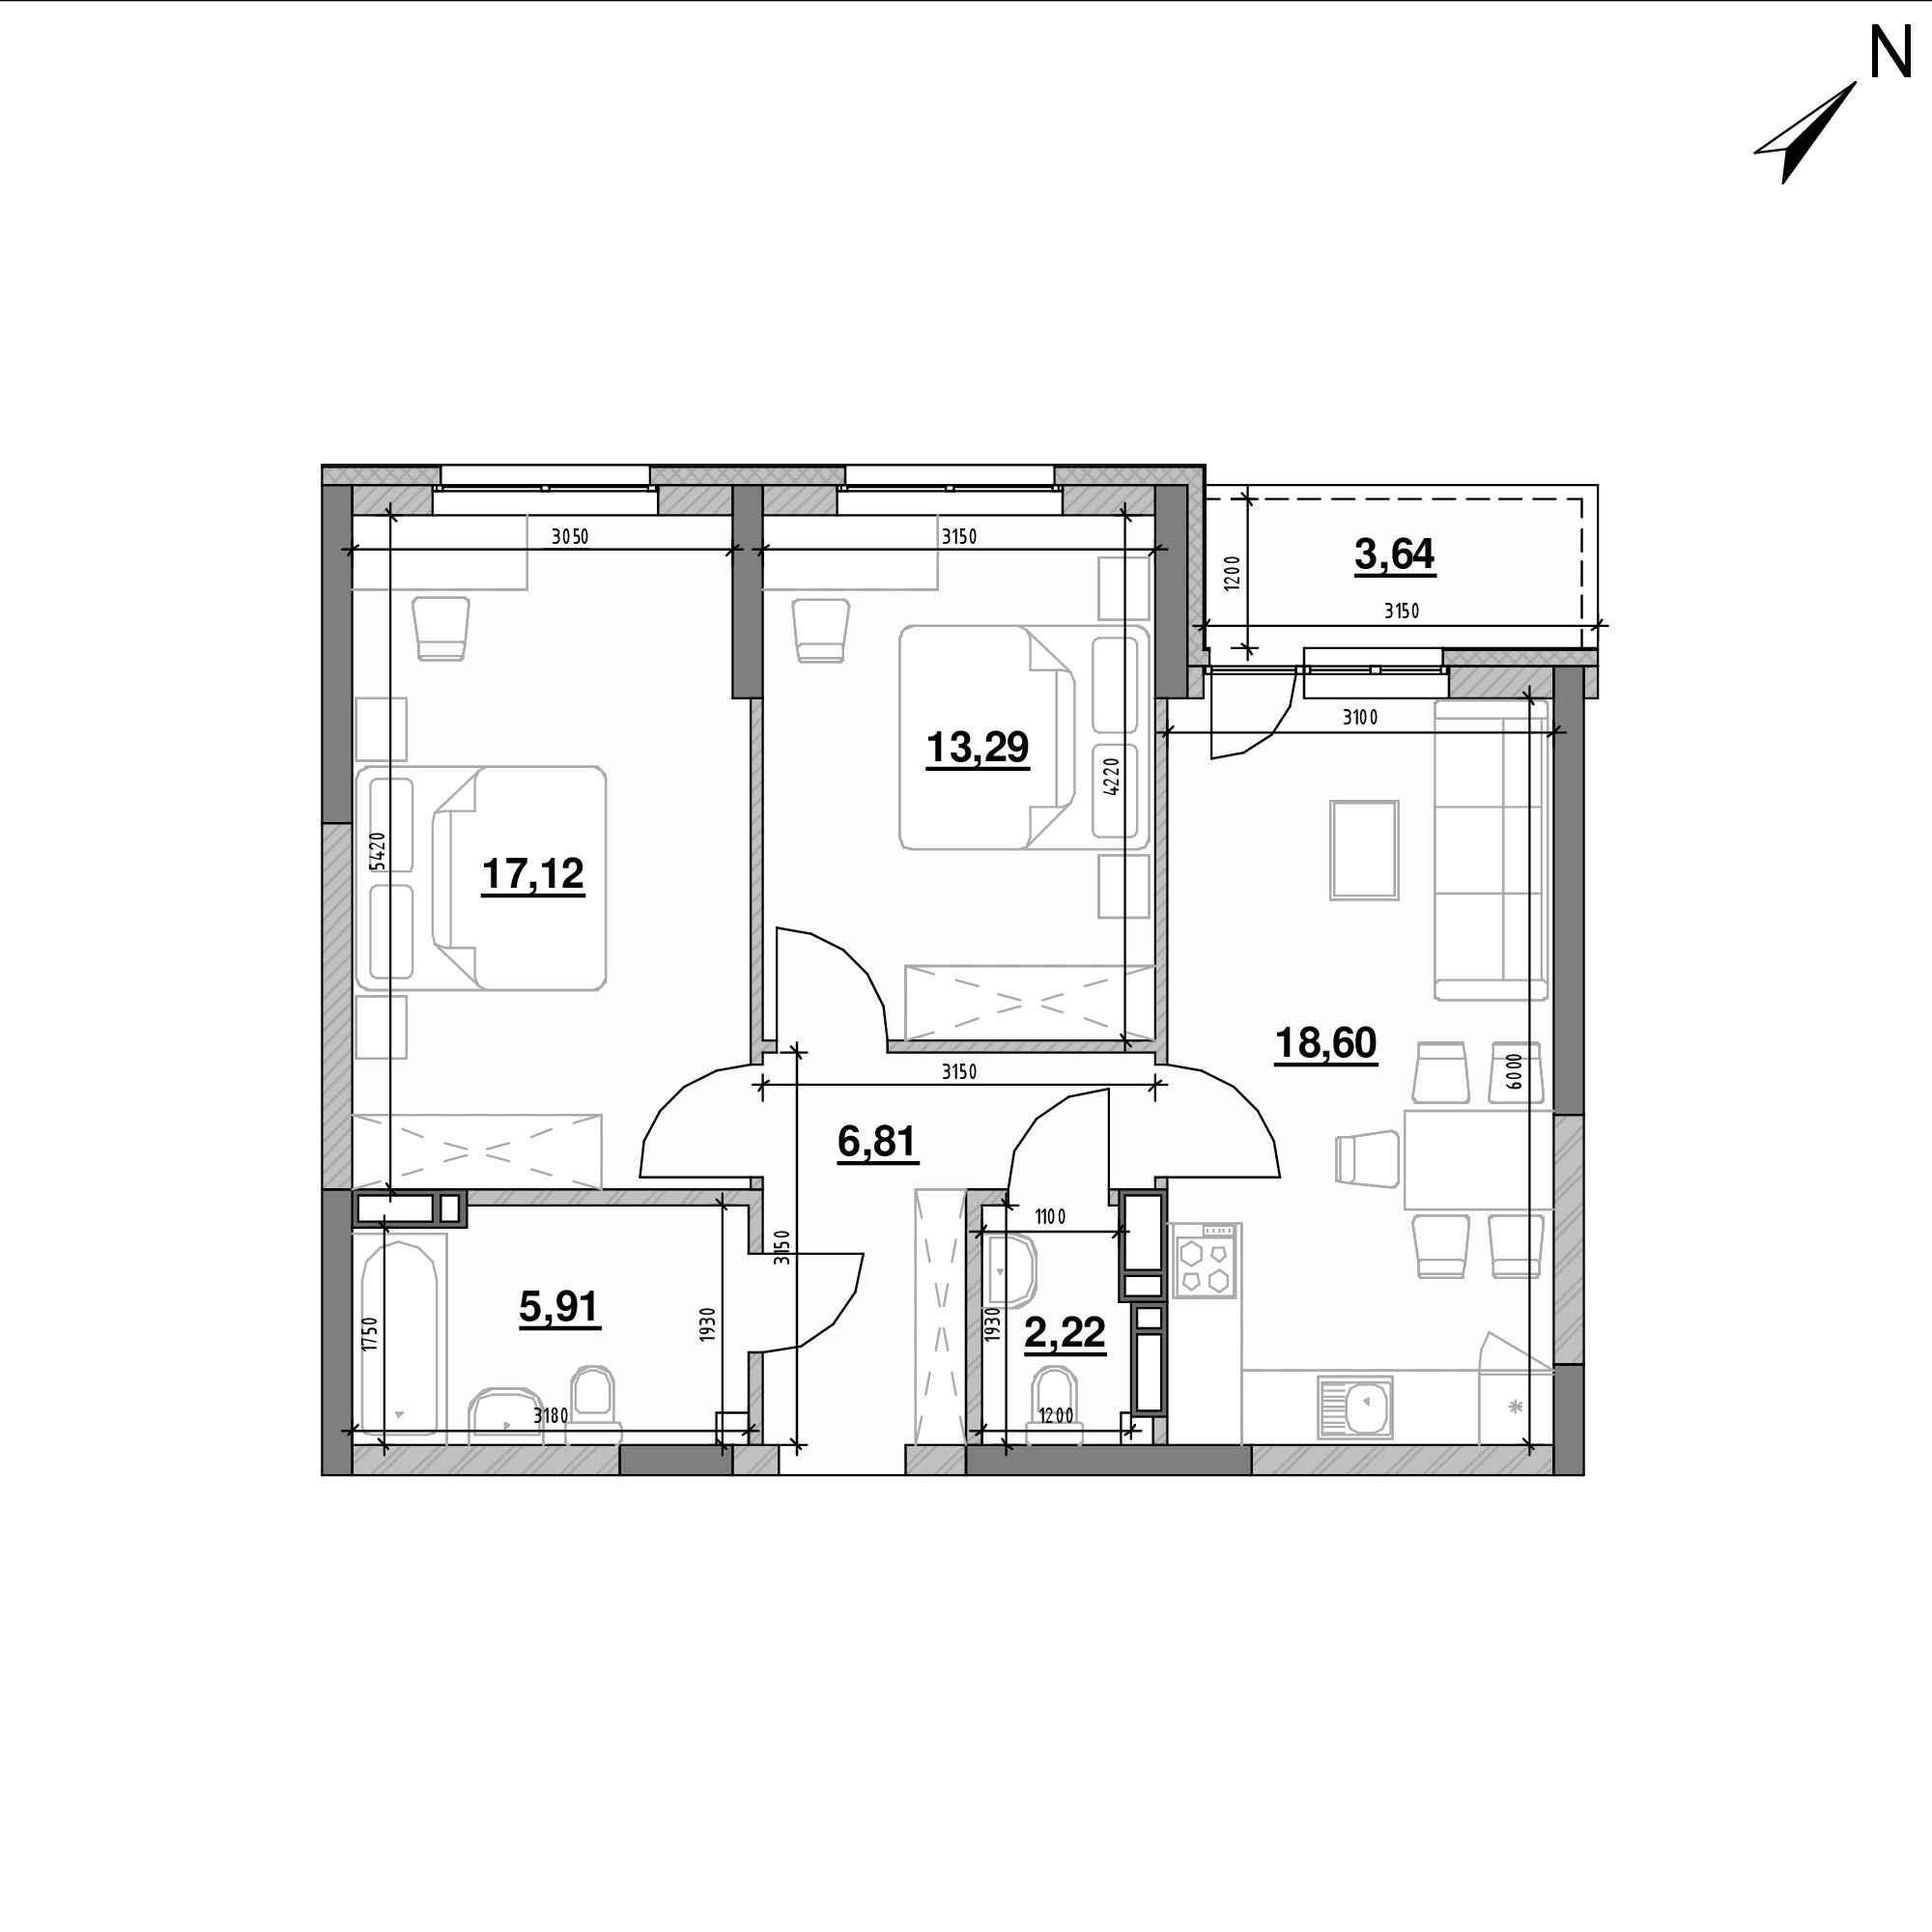 ЖК Оk'Land: планування 2-кімнатної квартири, №522, 67.59 м<sup>2</sup>